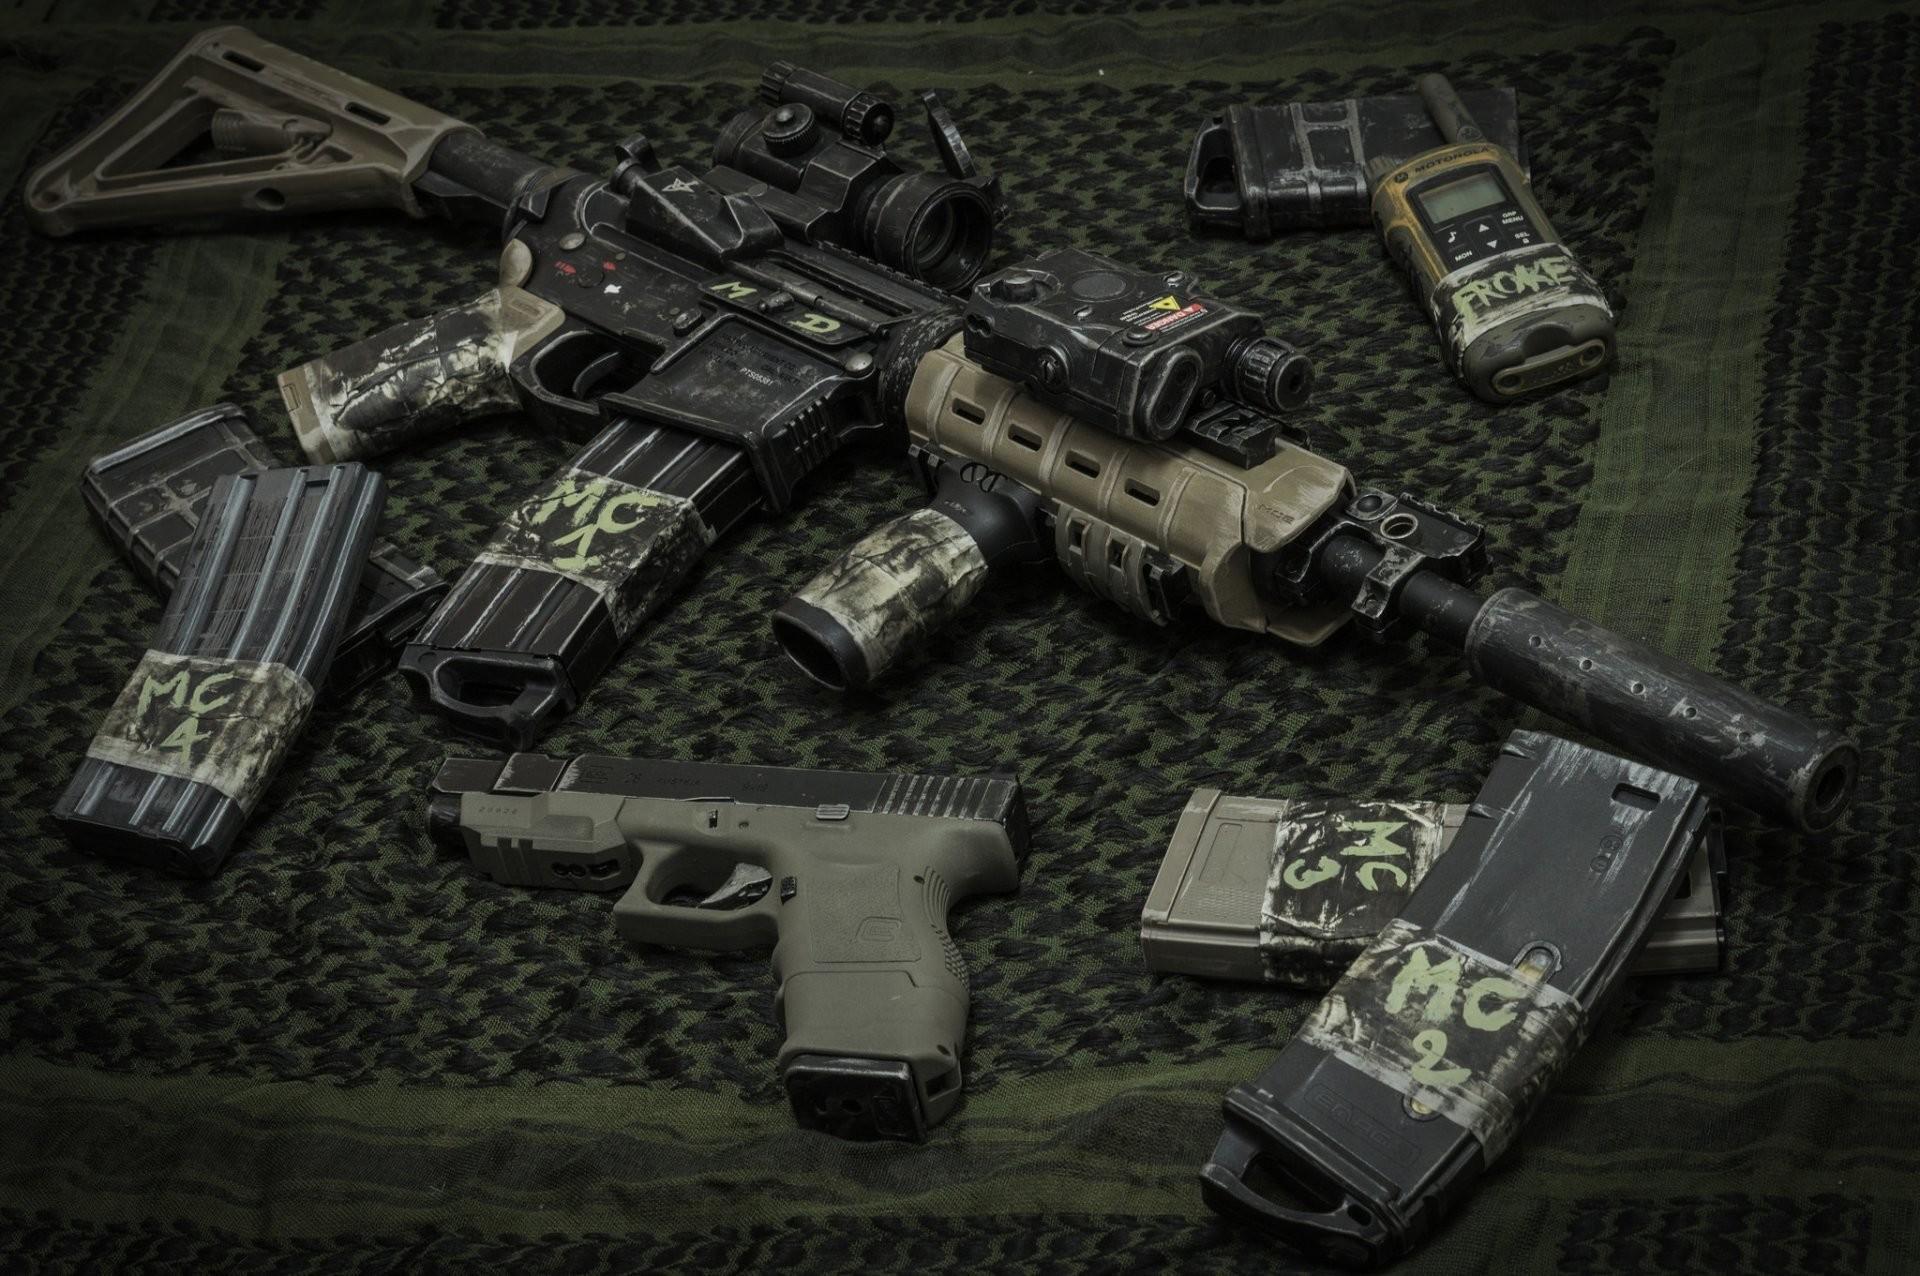 m4 assault rifle carabiner weapon glock 26